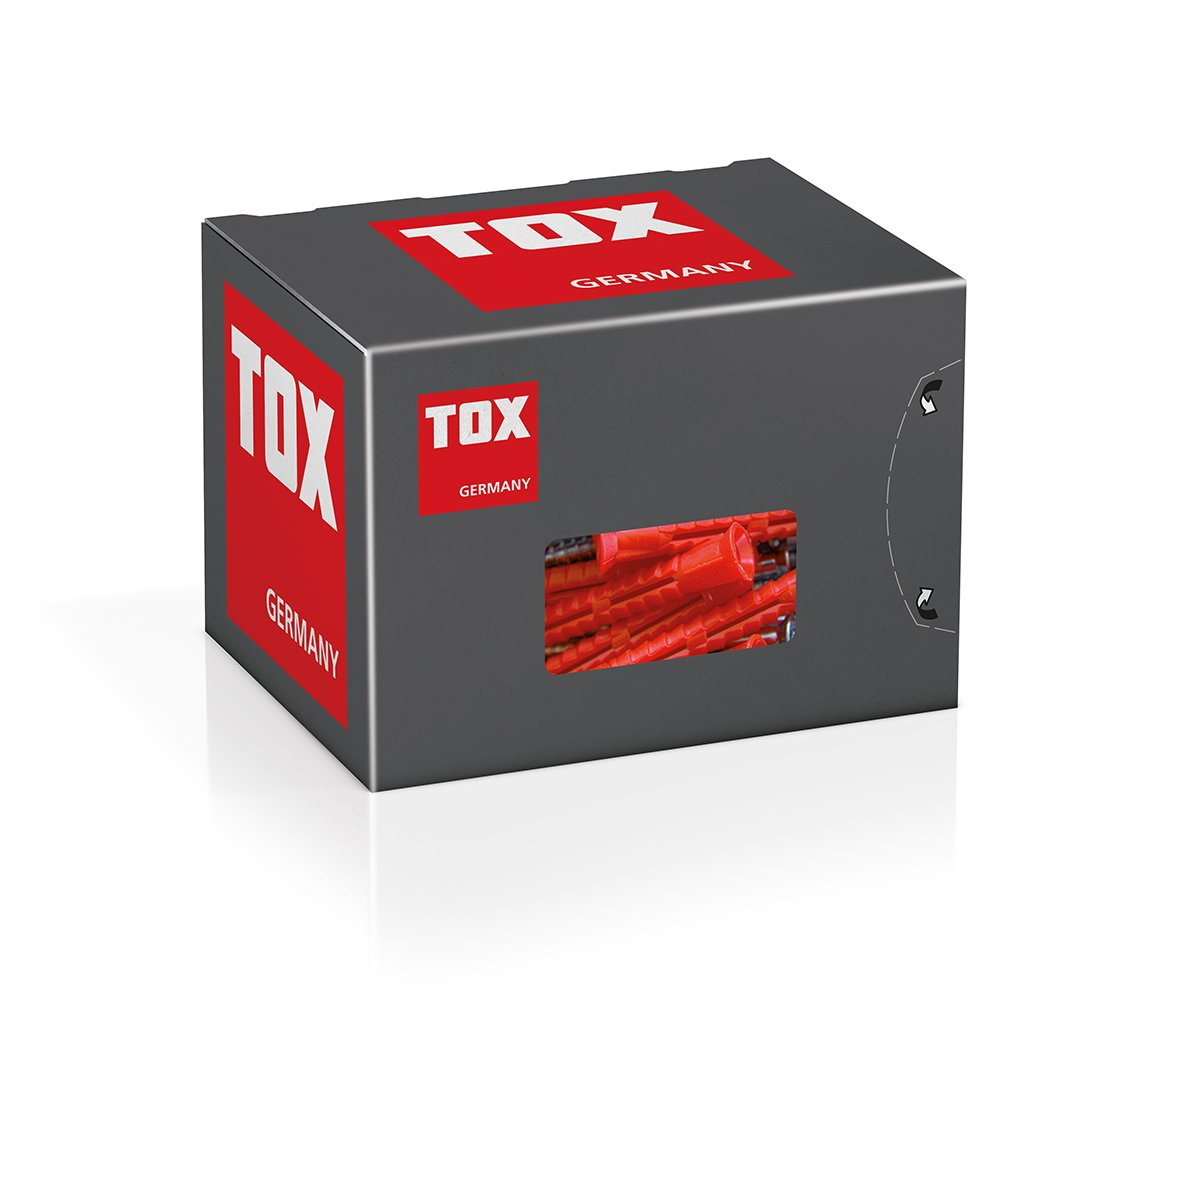 TOX Allzweck Rahmend/übel Constructor 10 x 160 mm 25 St/ück 022102521